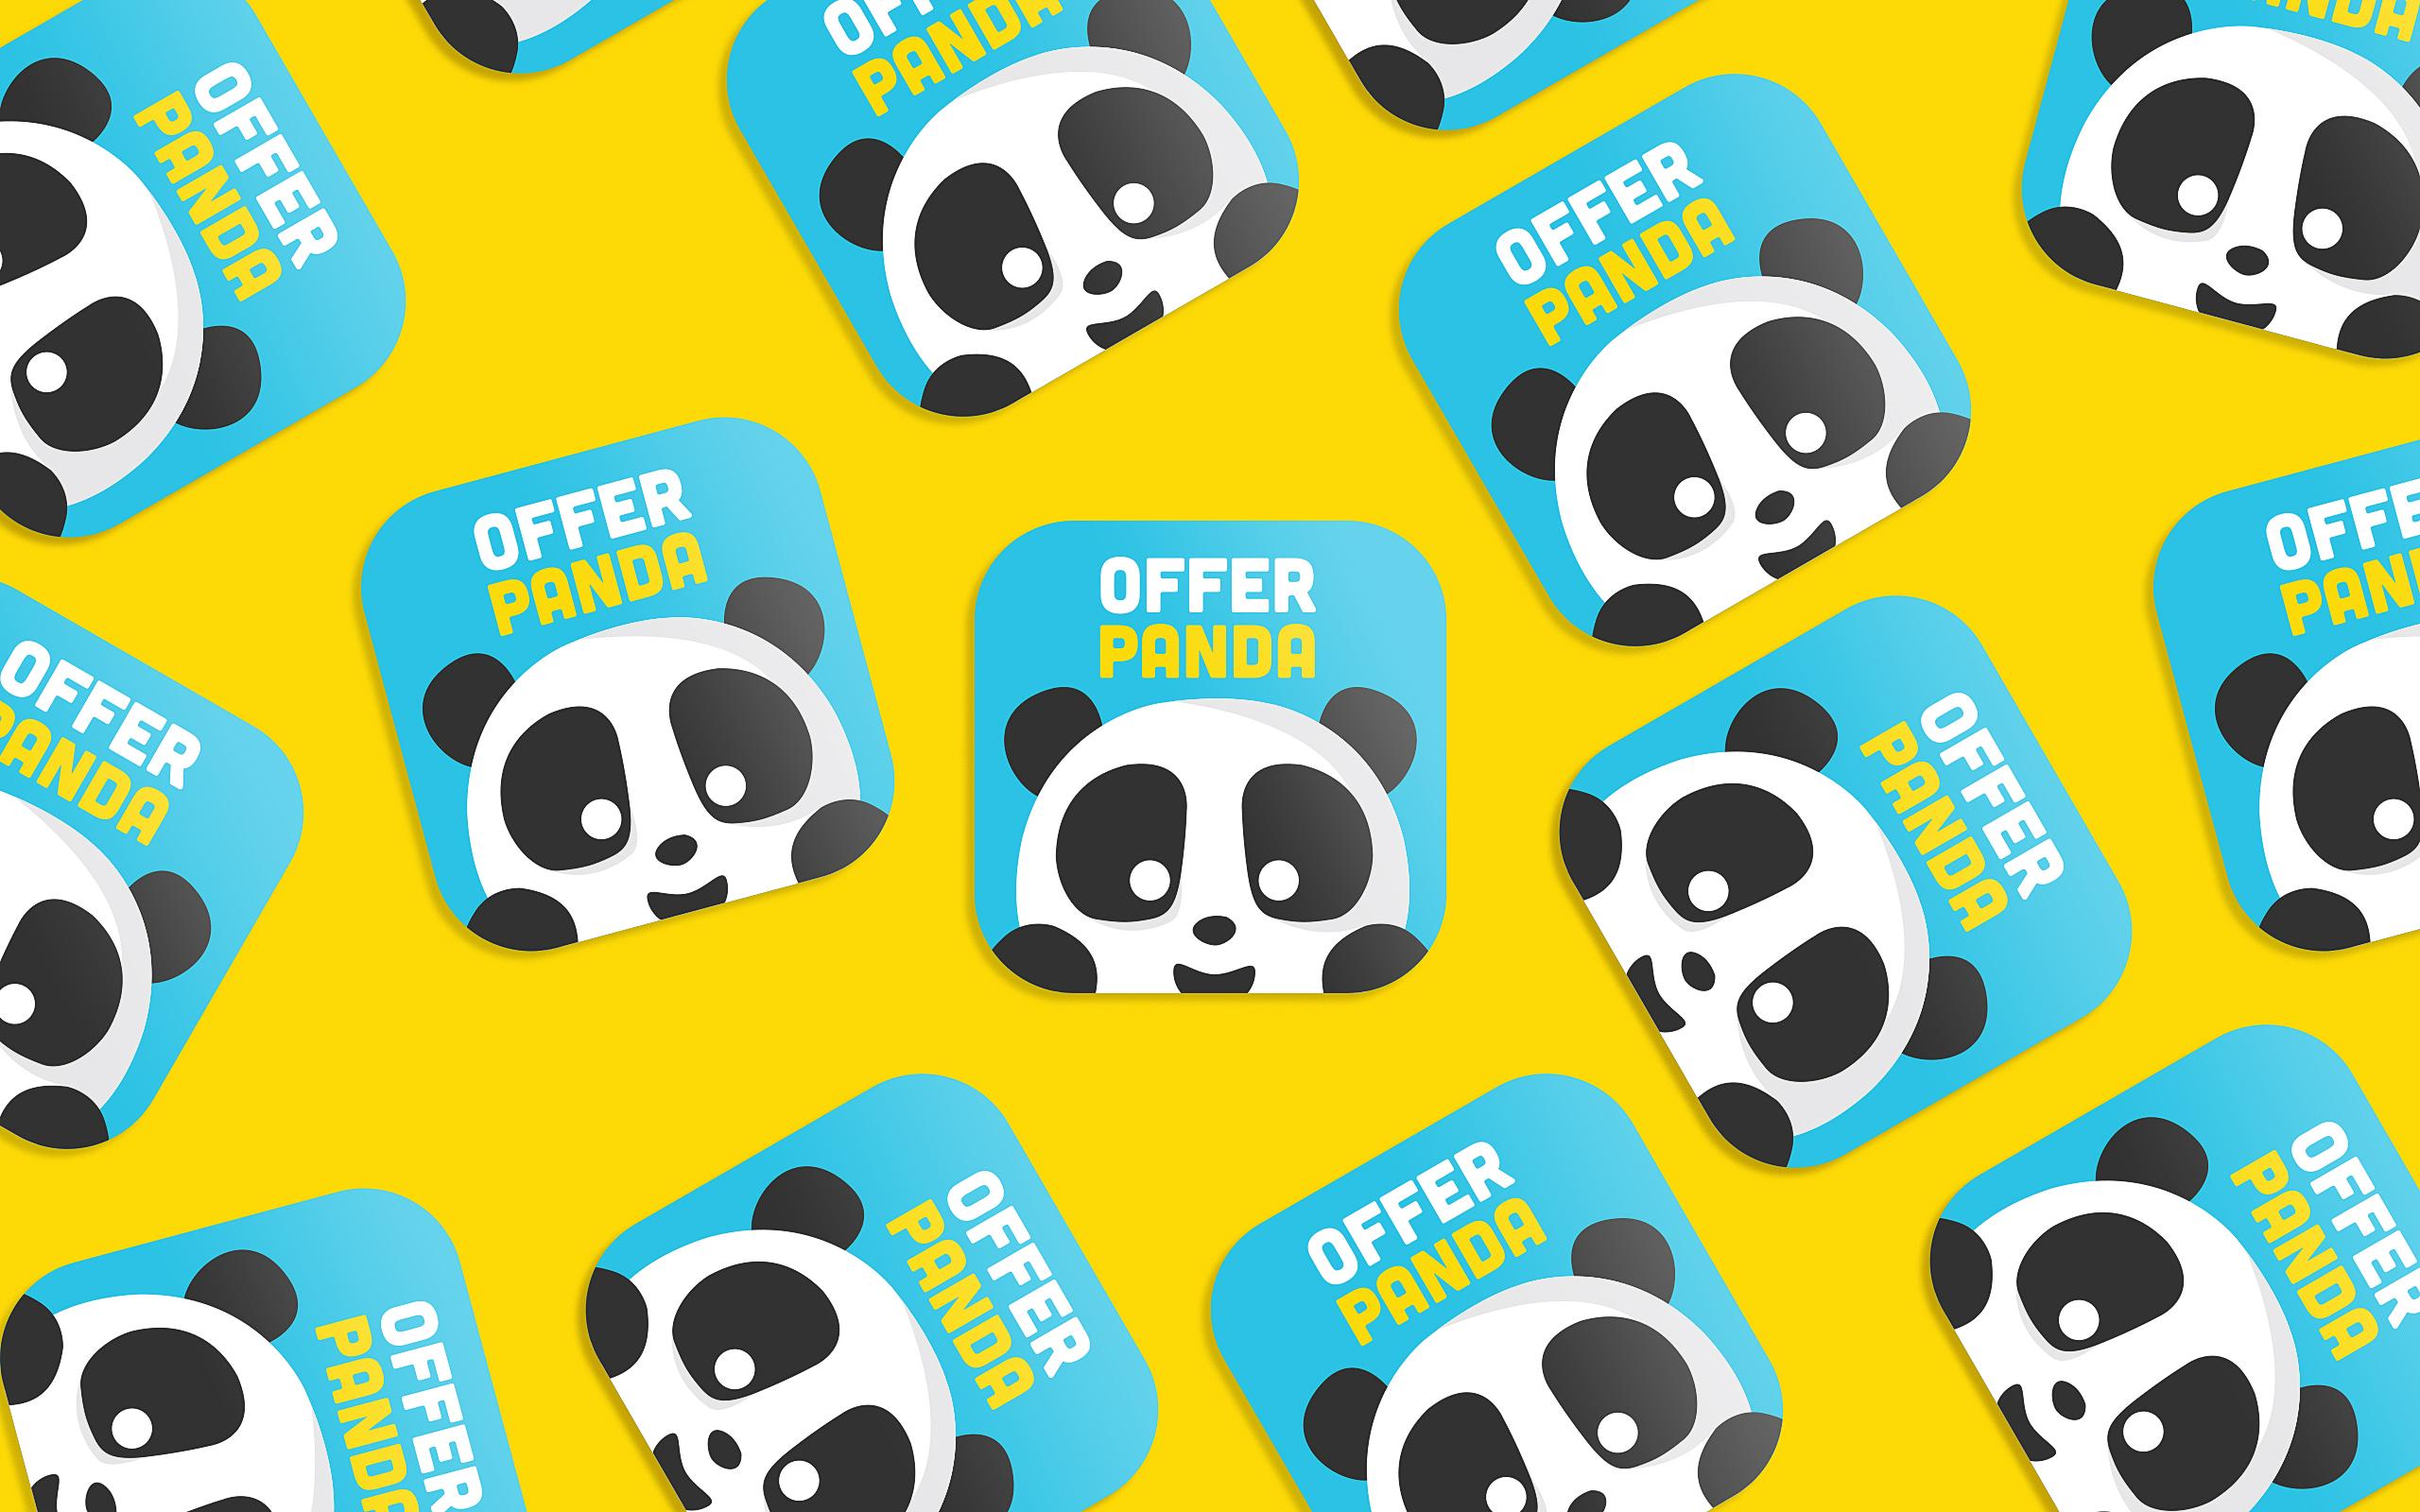 panda offer